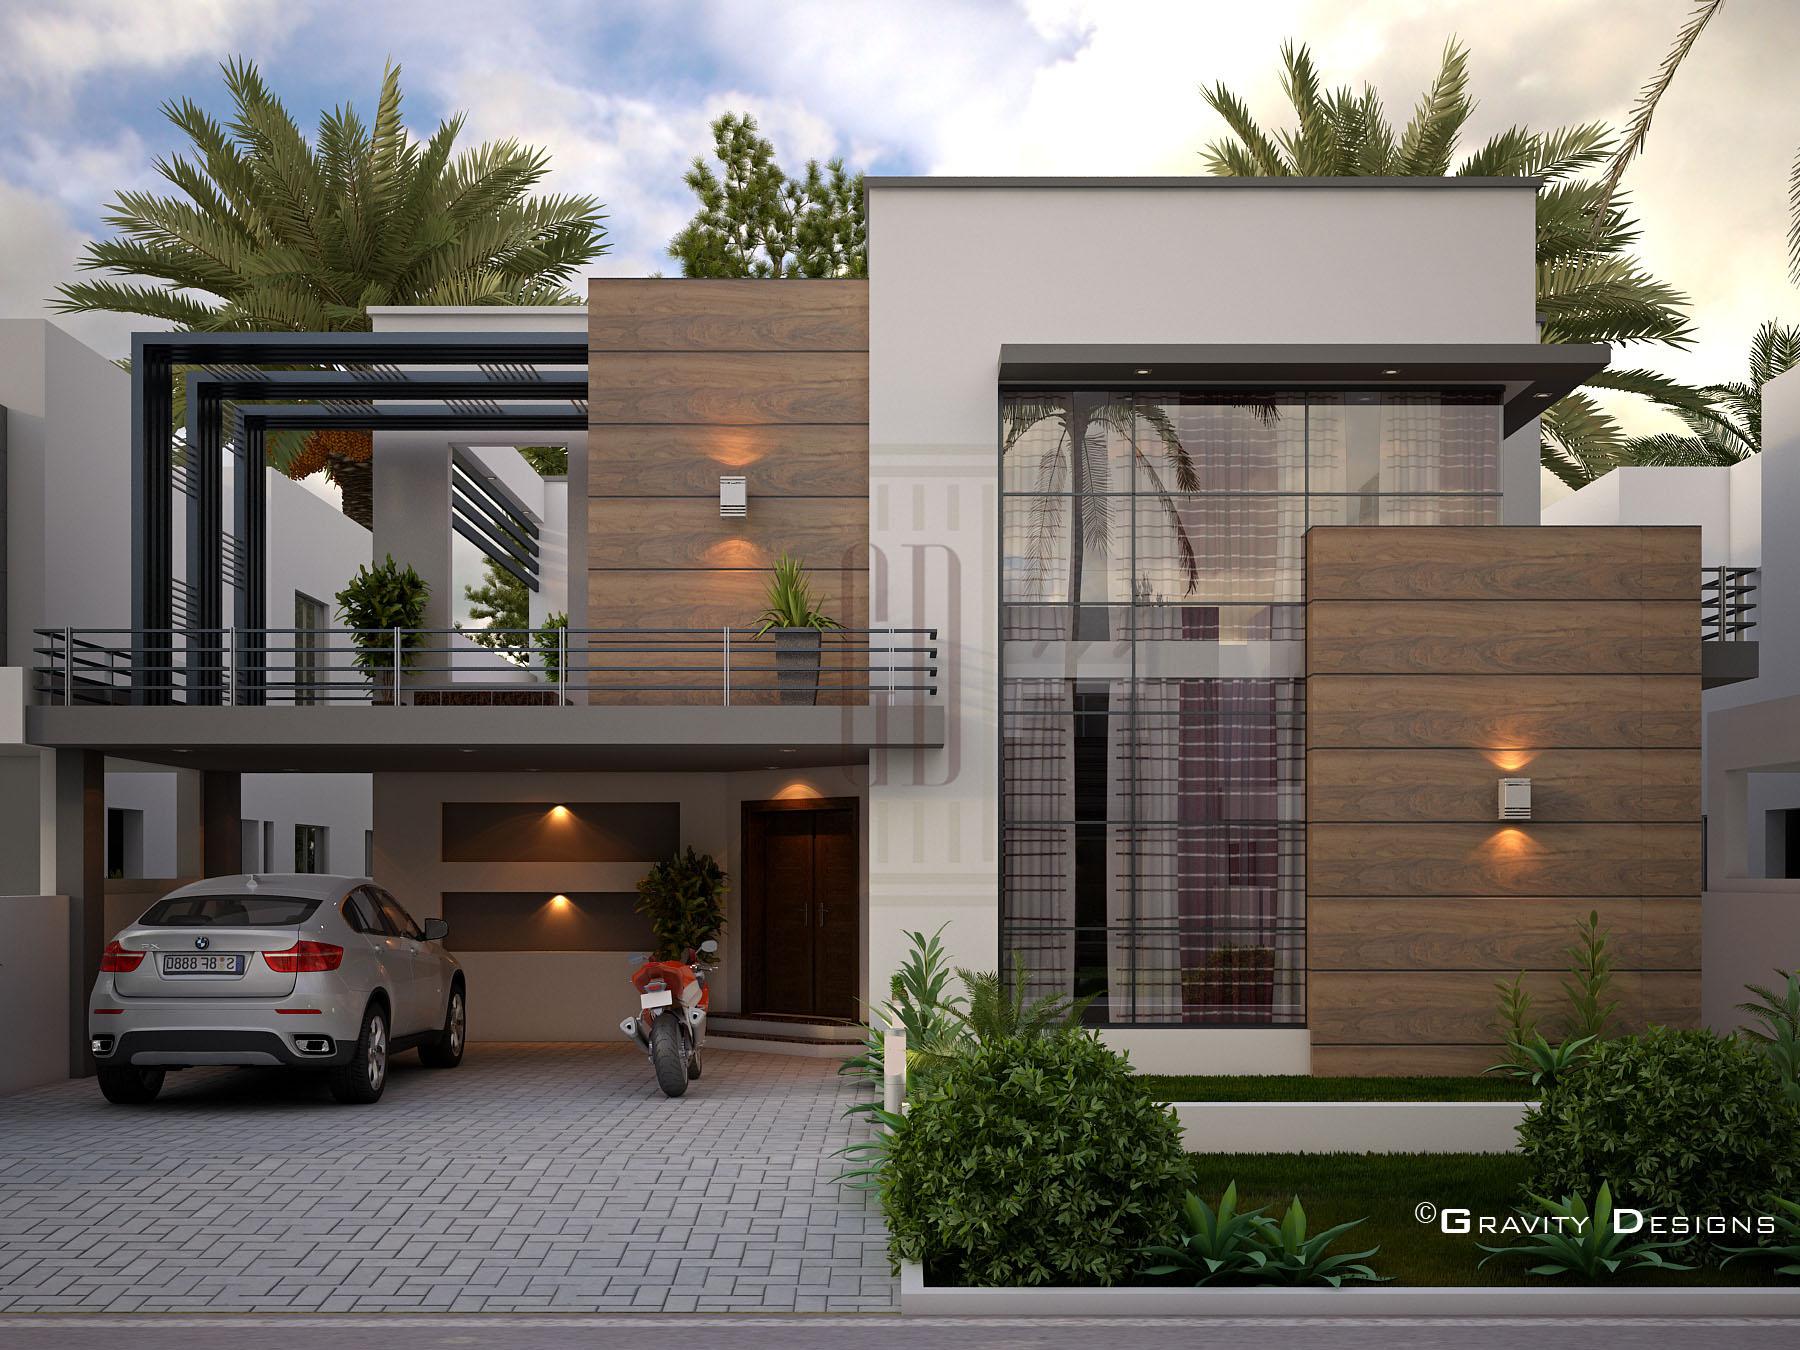 Residential Exterior Designs Gravity Design - Exterior-designs